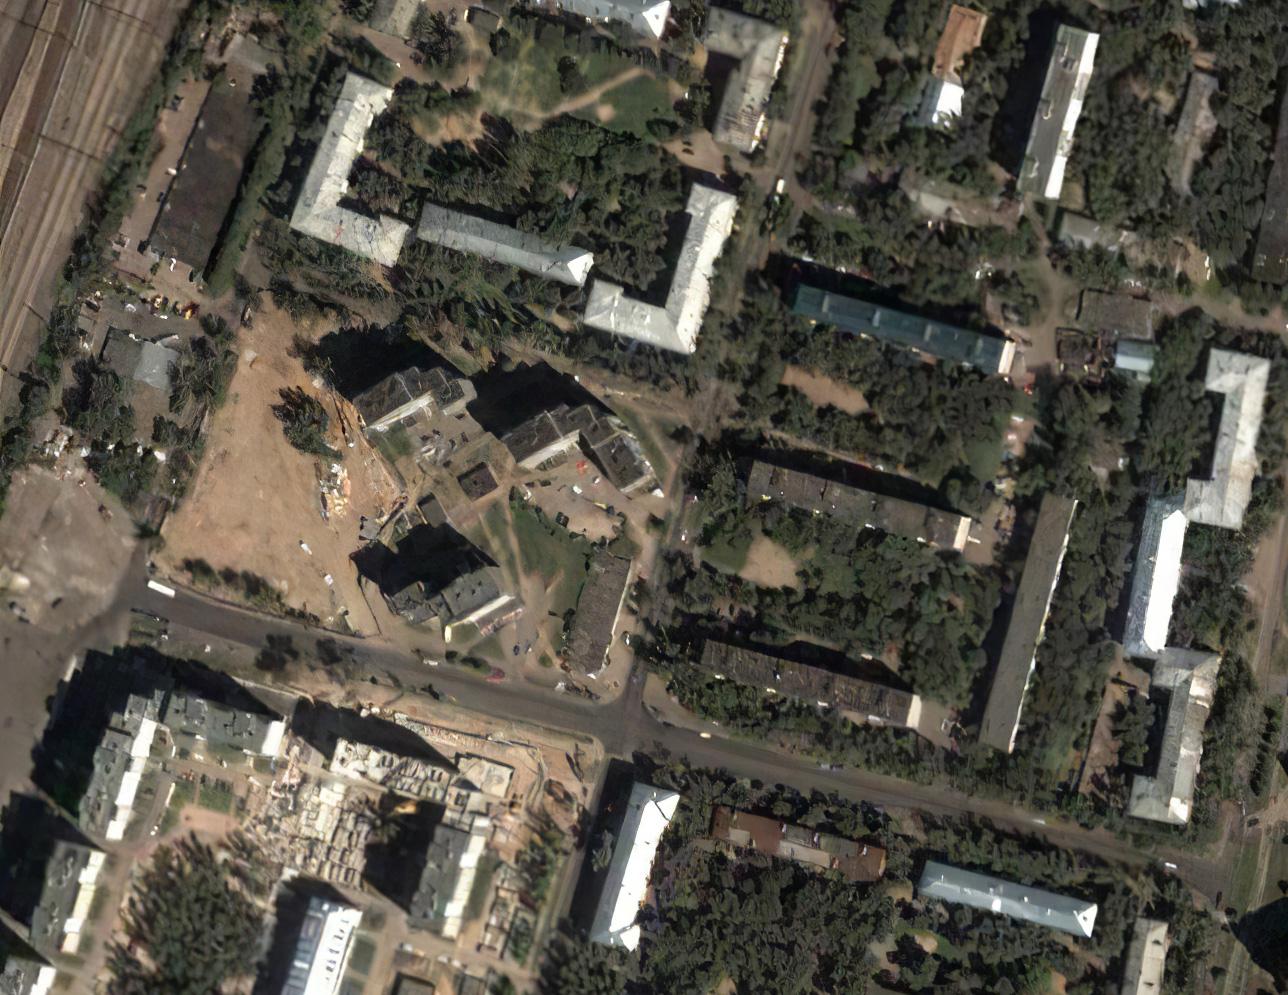 2003 Очаково, спутниковый снимок2